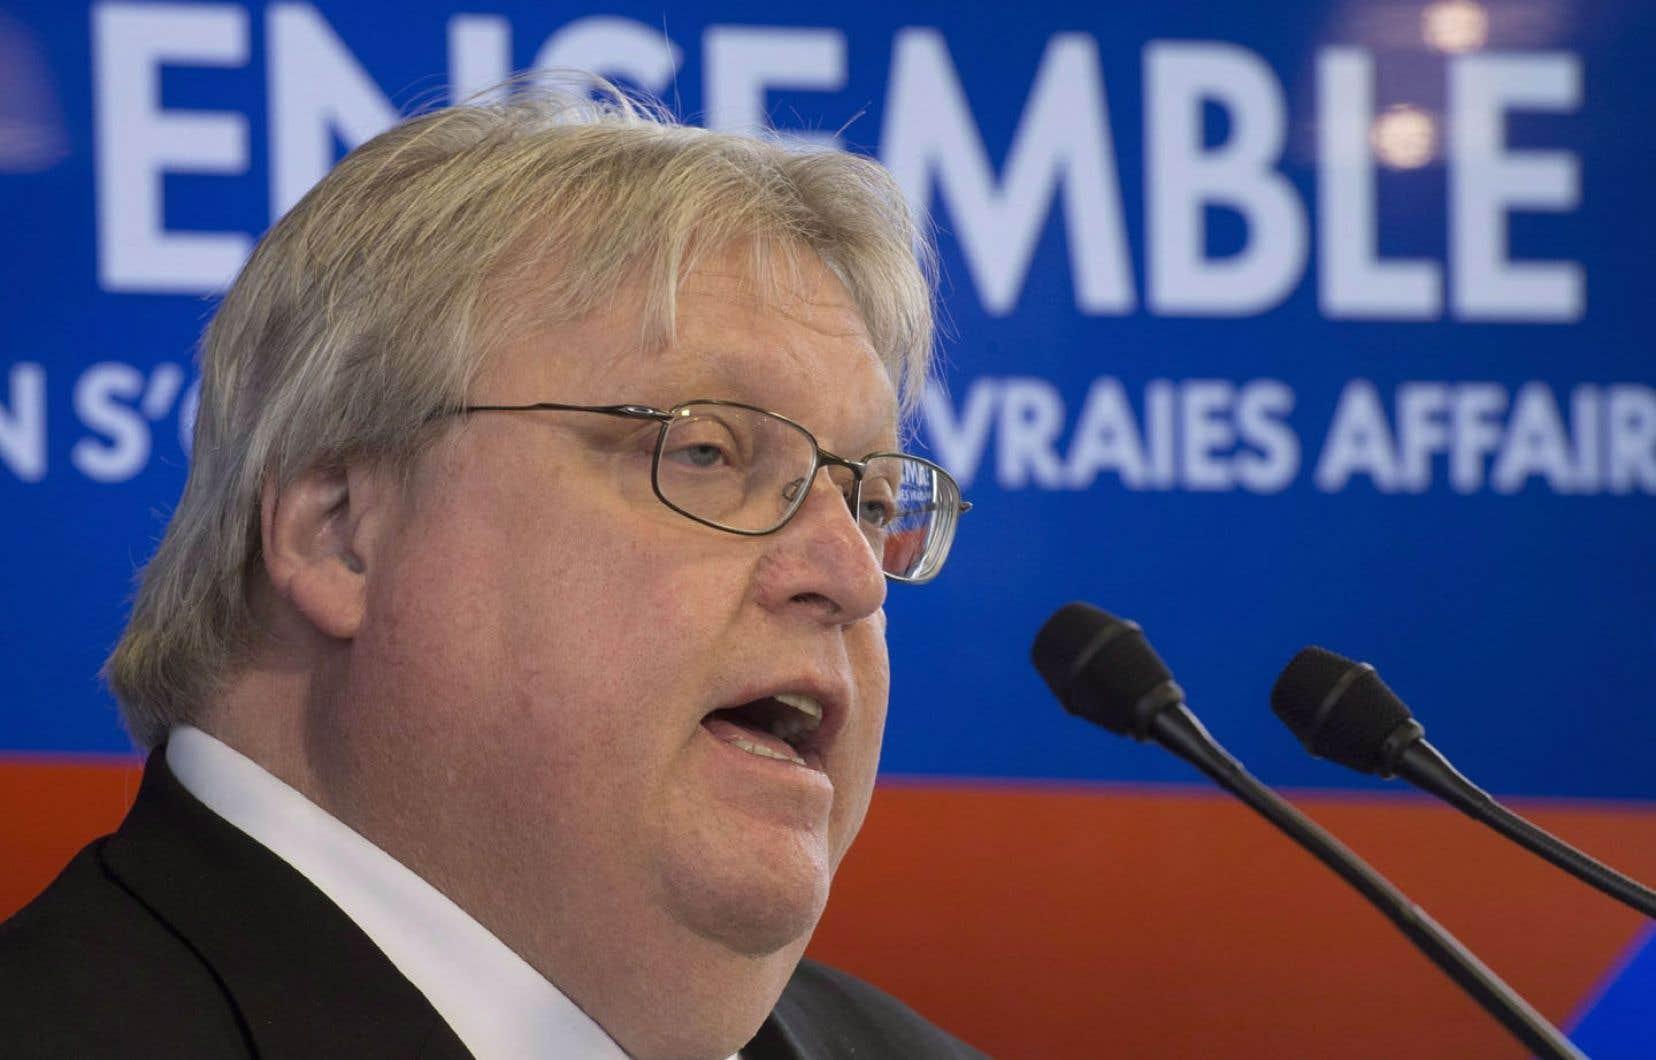 Gaétan Barrette a été élu dans La Pinière, devant la candidate sortante Fatima Houda-Pepin, devenue indépendante.